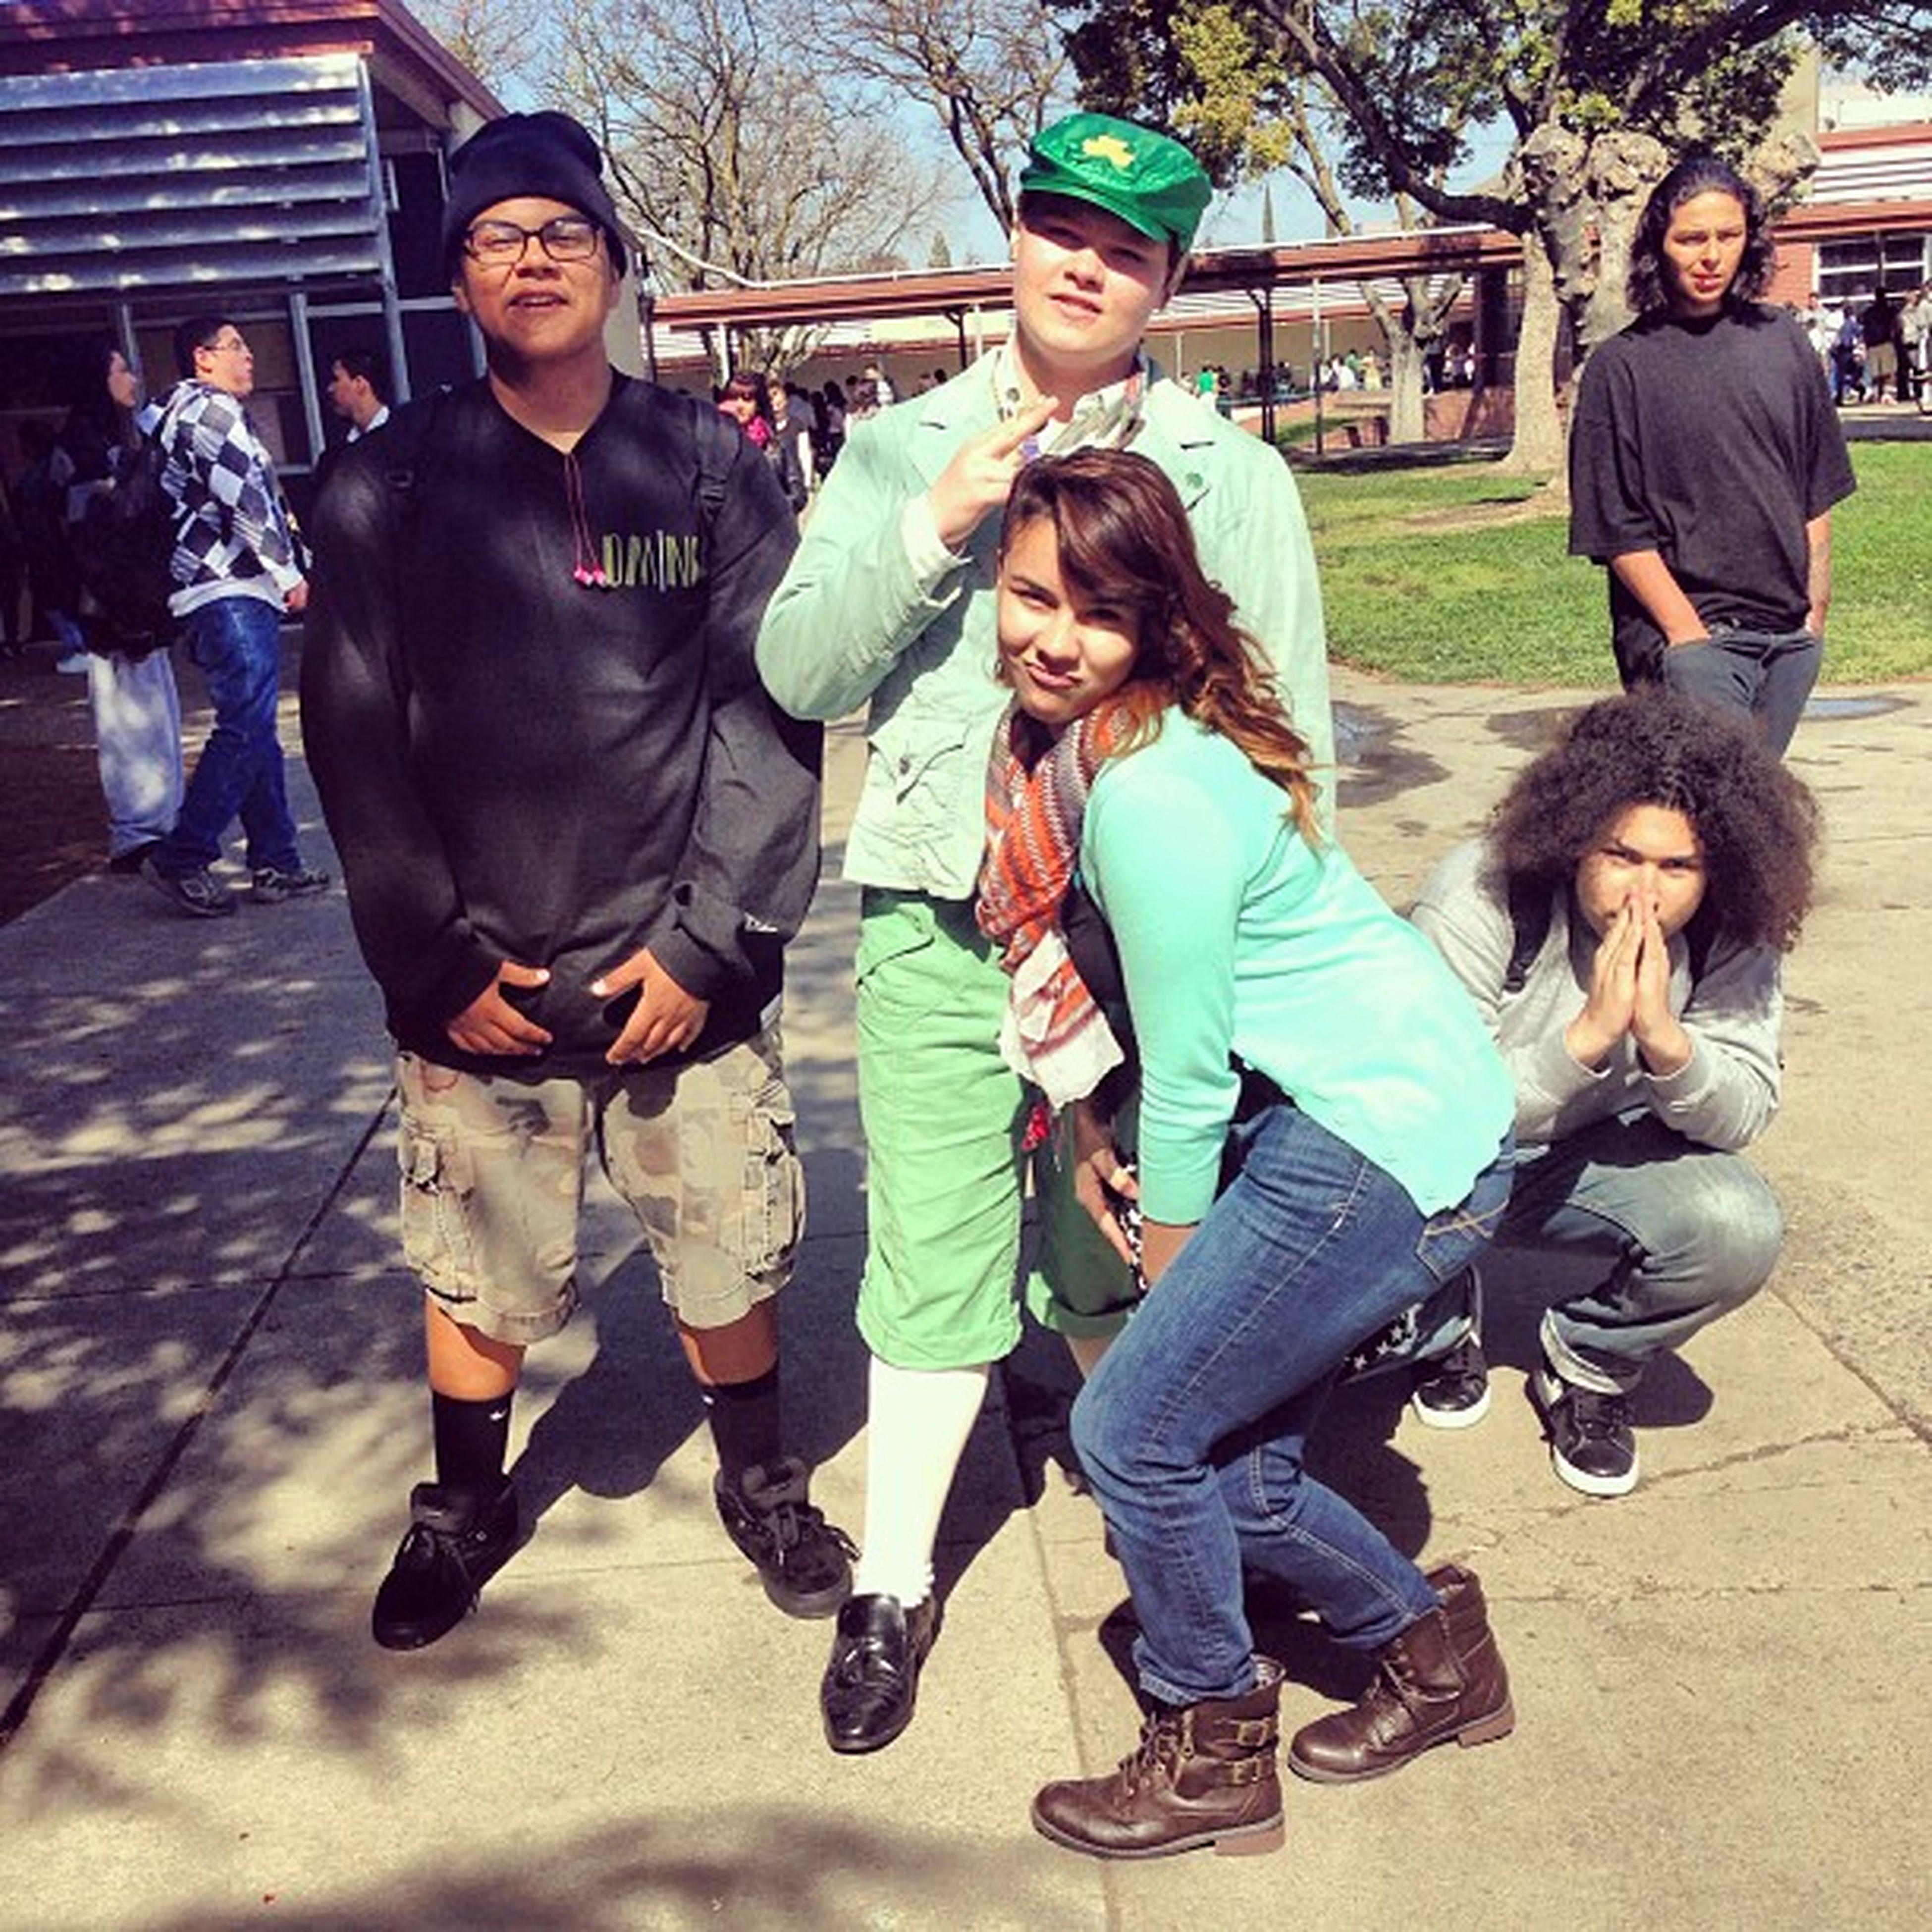 Me @swellswellswell and Valencia with a leprechaun Squat PraiseLeprechaun